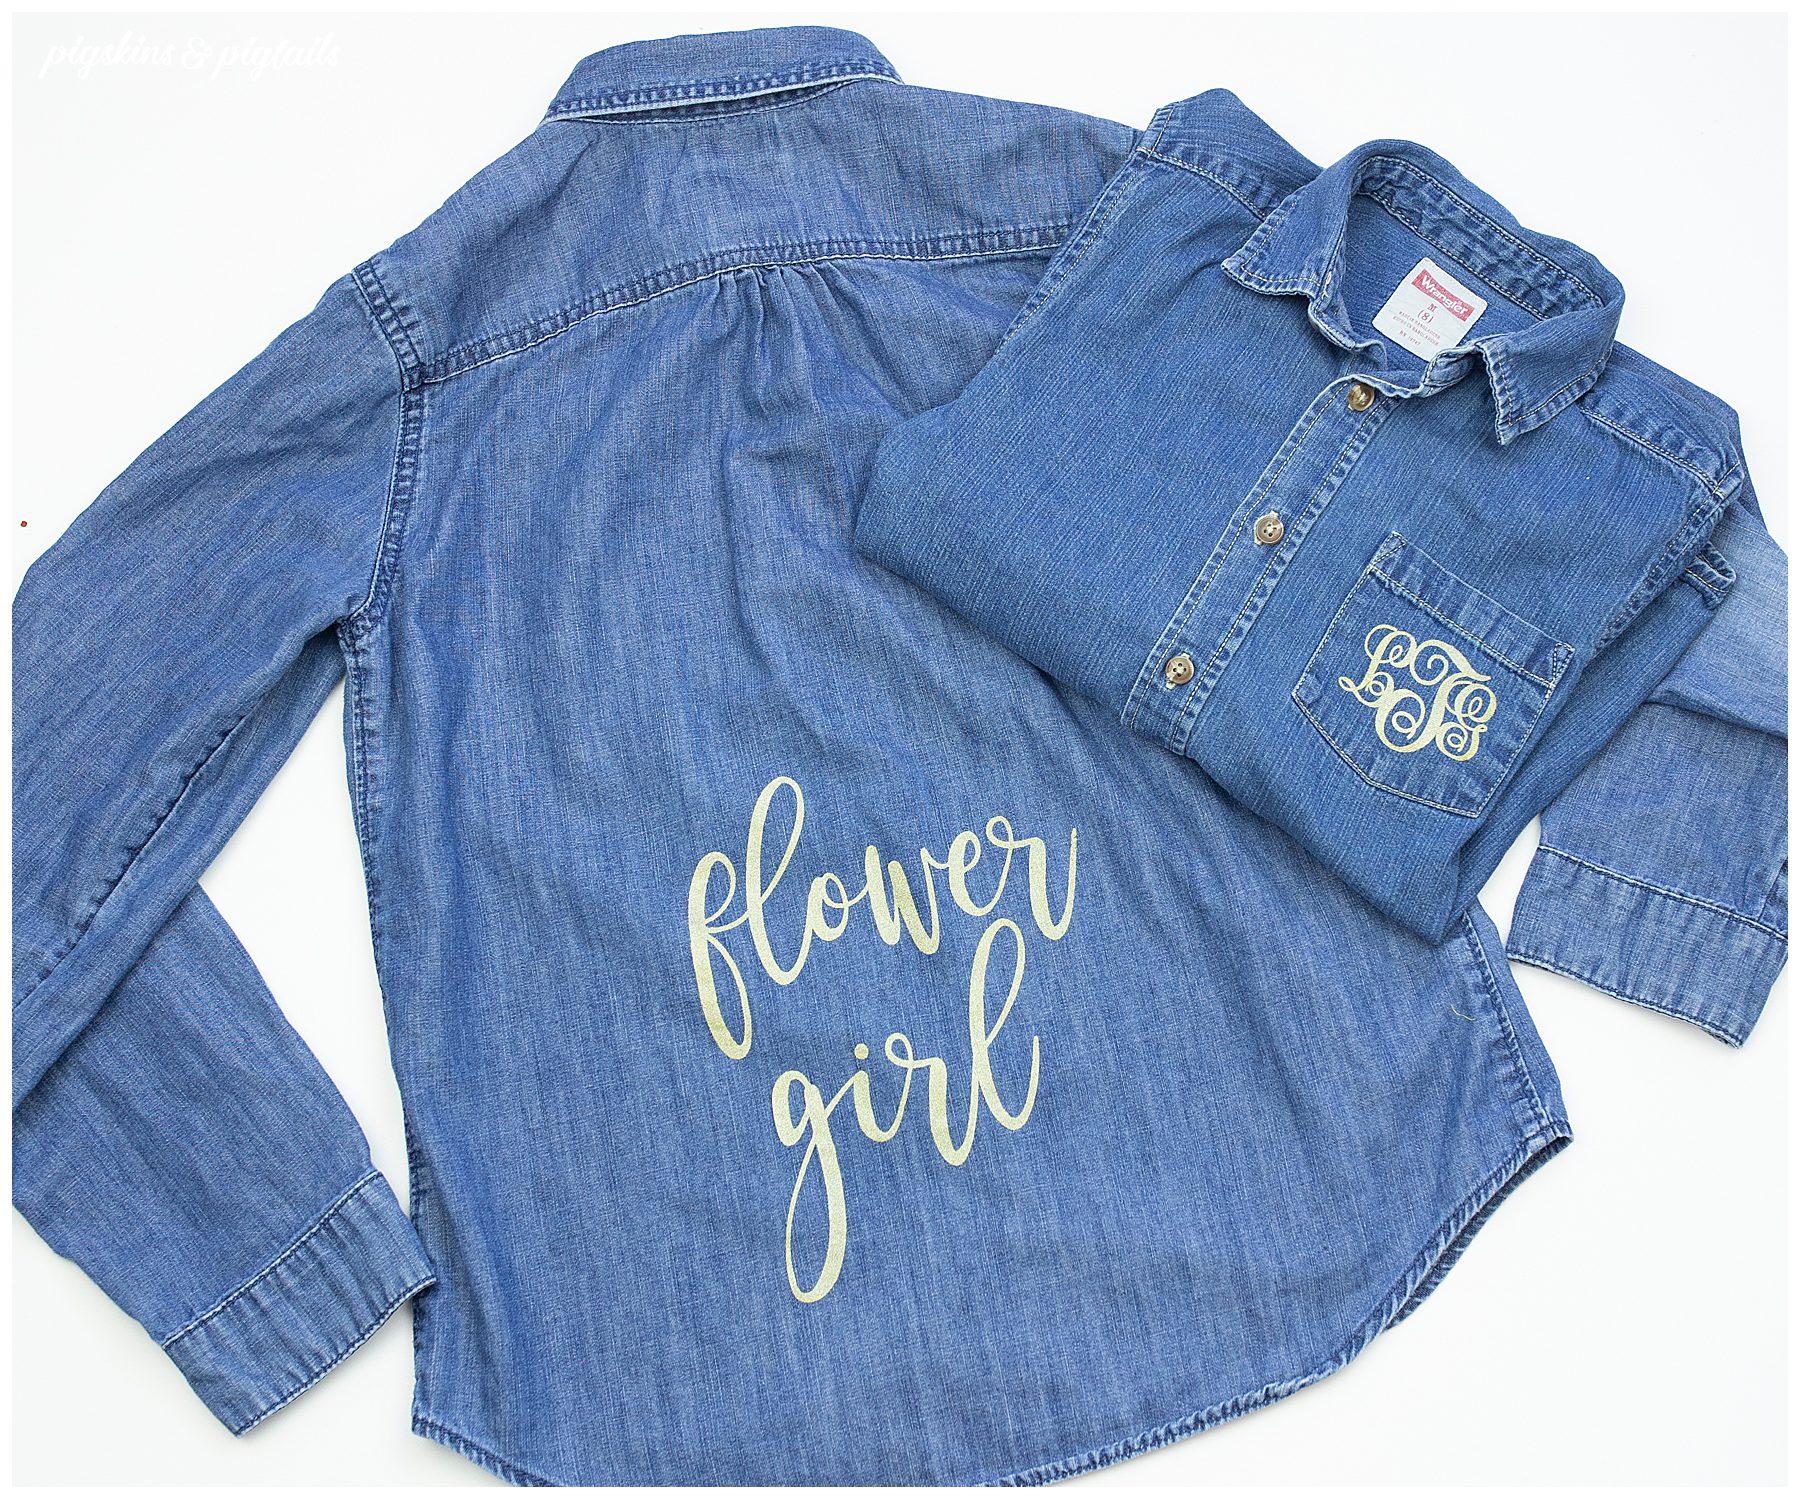 flower girl shirt denim button up cricut personalized monogram